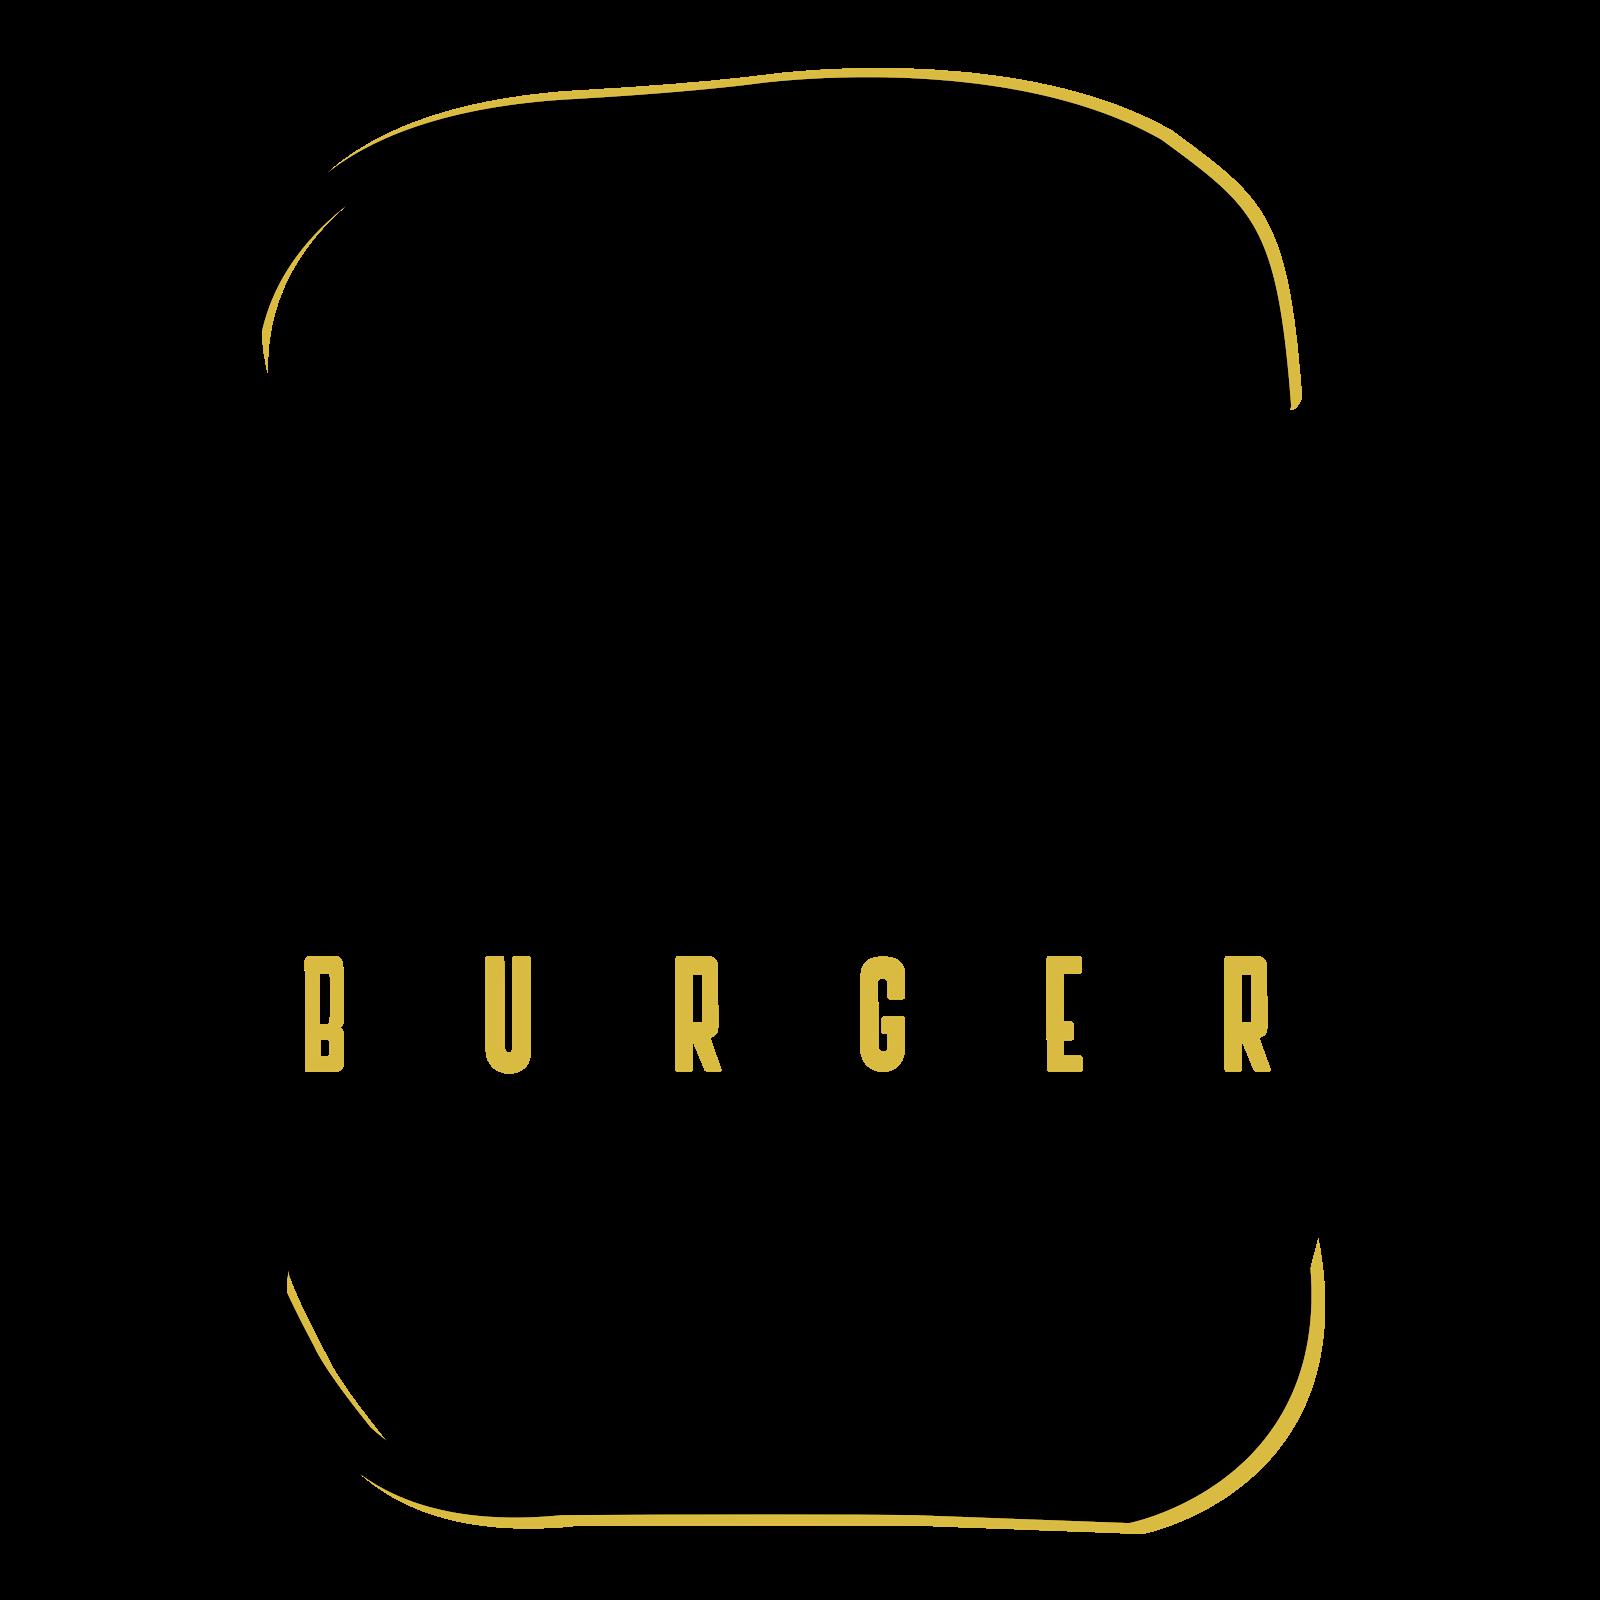 Sapezal Burguer